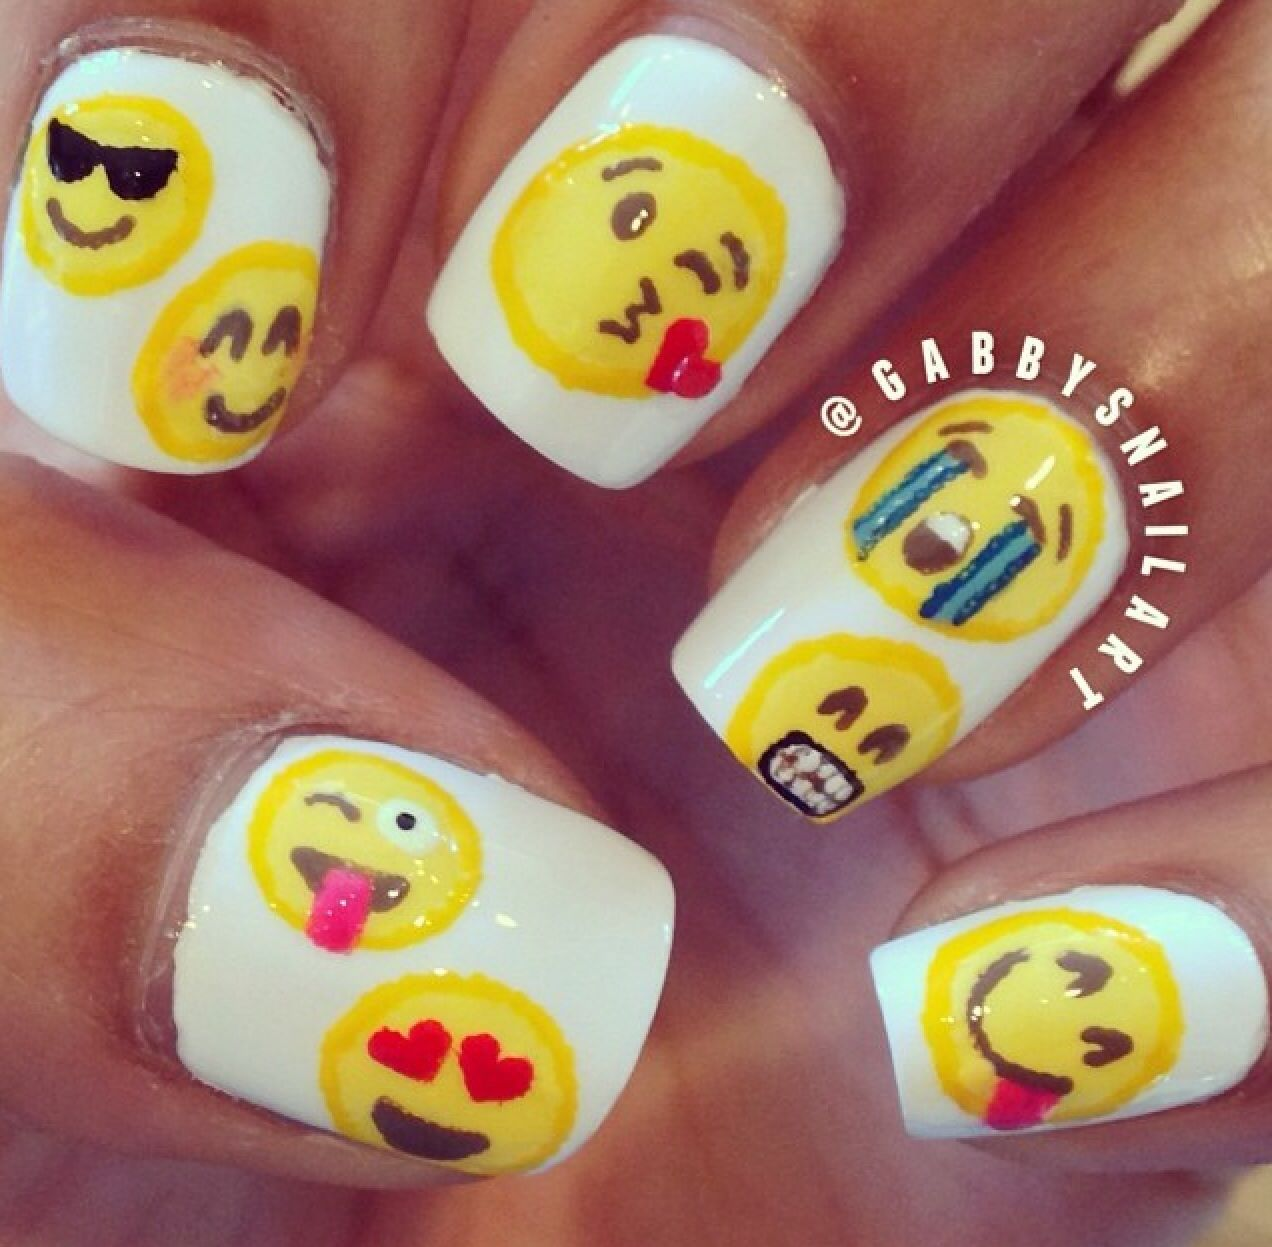 Pin de Brenda Carreon en Valeria Emoji   Pinterest   Uñas lindas ...